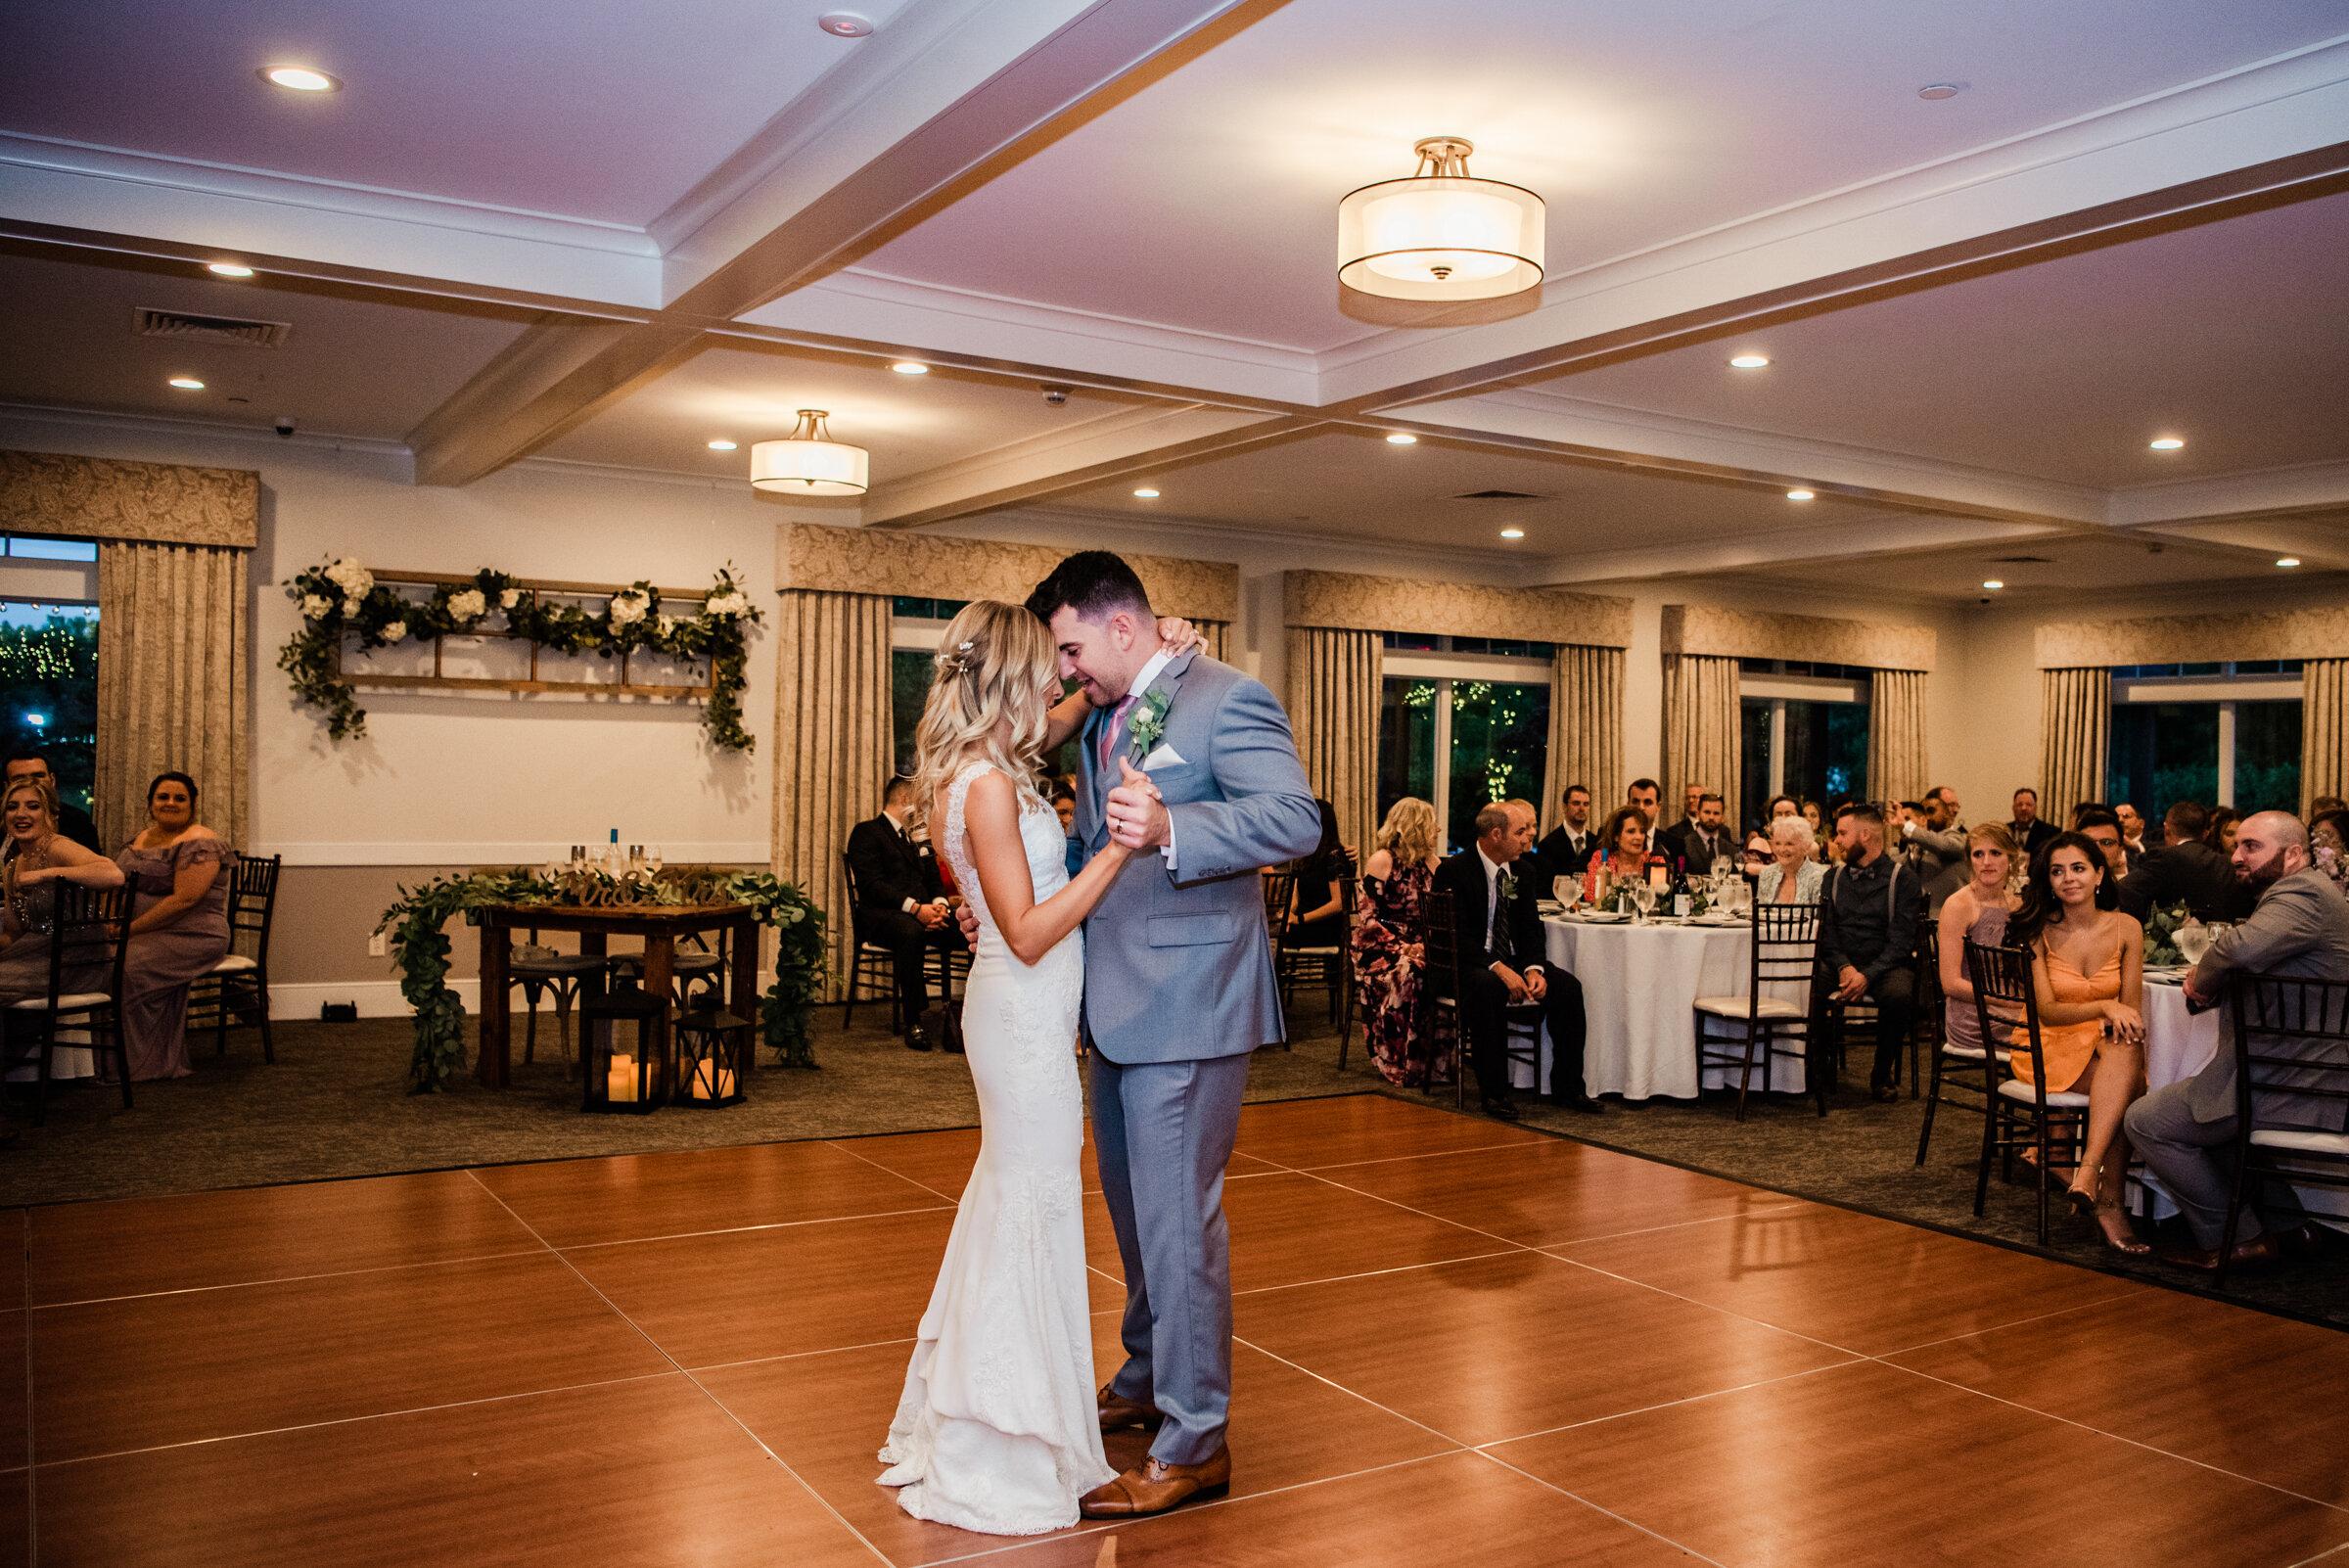 Deerfield_Country_Club_Rochester_Wedding_JILL_STUDIO_Rochester_NY_Photographer_DSC_7124.jpg